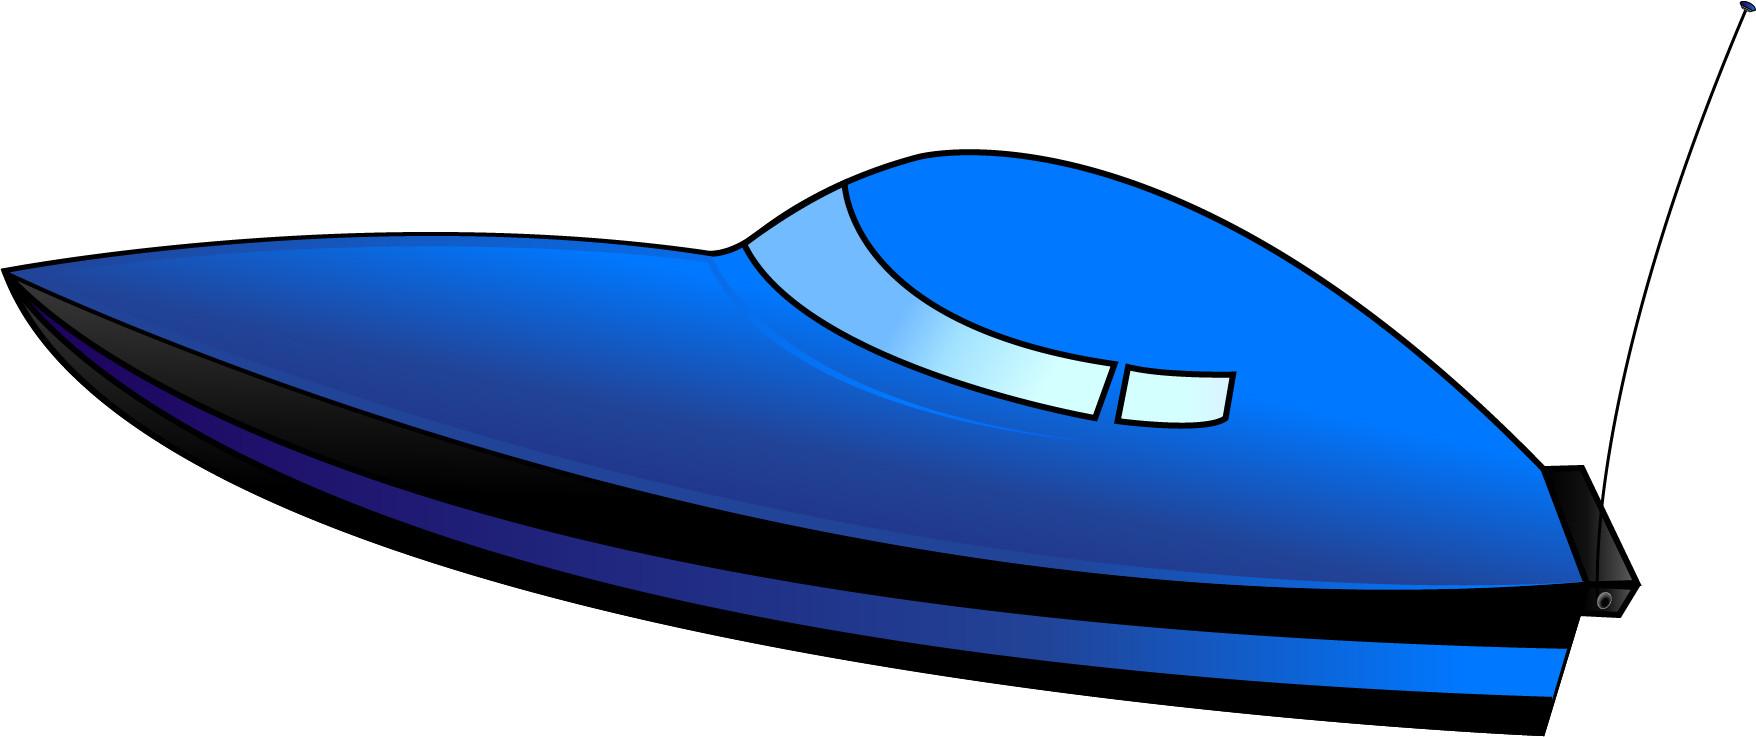 Antonio medina boat blue